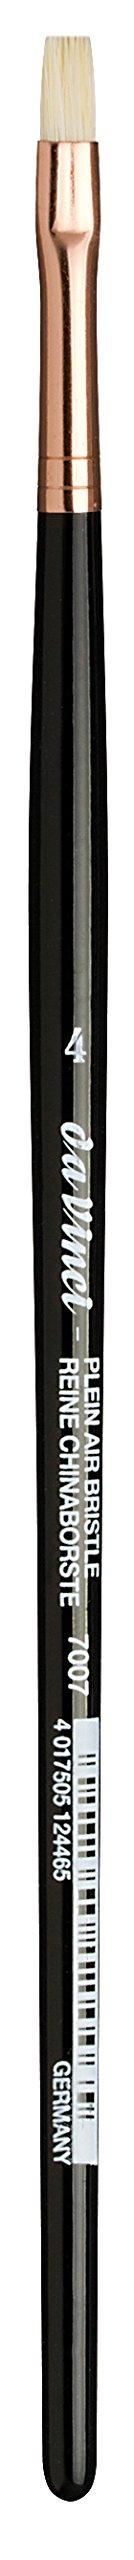 da Vinci Hog Bristle Series 7007 Plein Air Oil Painting Brush, Flat Short with Black Lacquered Handle and Copper Ferrule, Size 4 (7007-04)